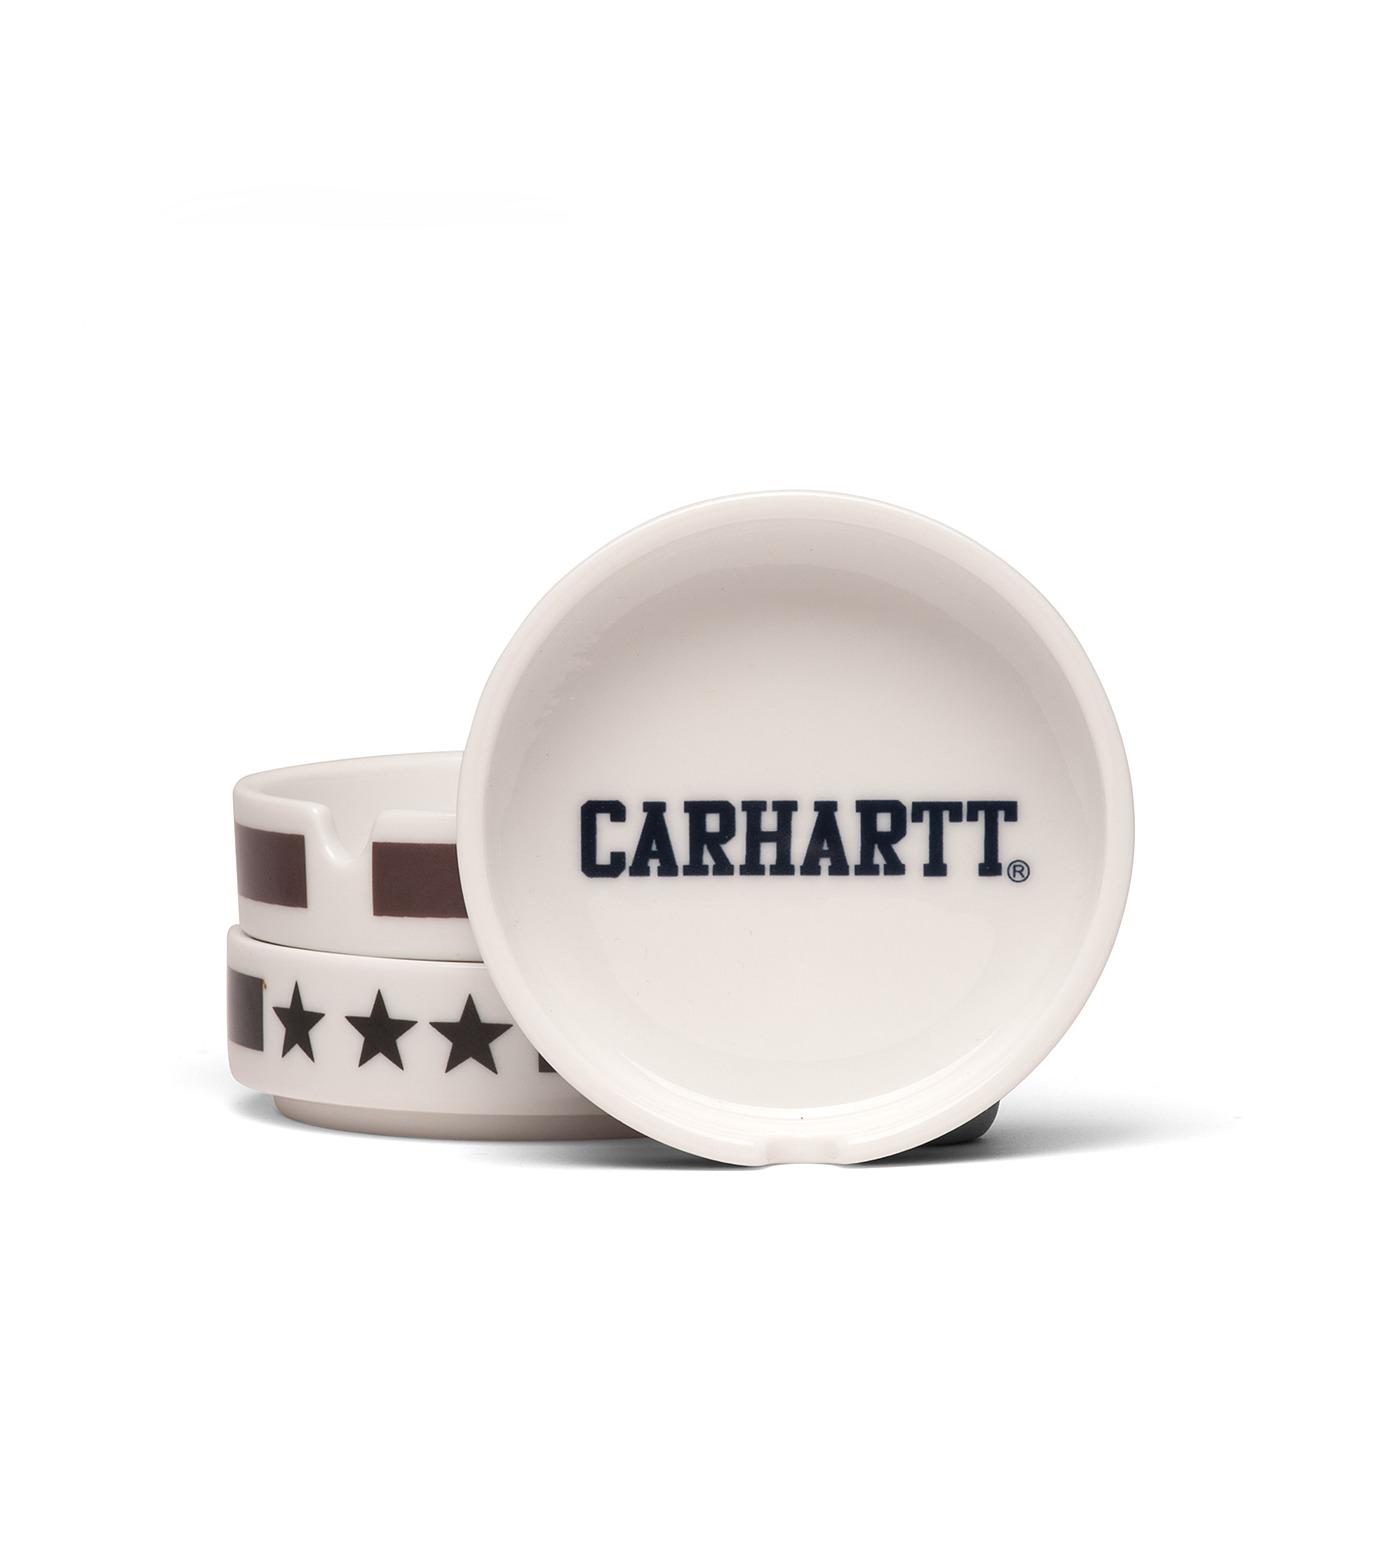 Carhartt(カーハート)のMINI ASHTRAYS-MULTI COLOUR(OTHER-GOODS/OTHER-GOODS)-I020350-15F-9 拡大詳細画像1